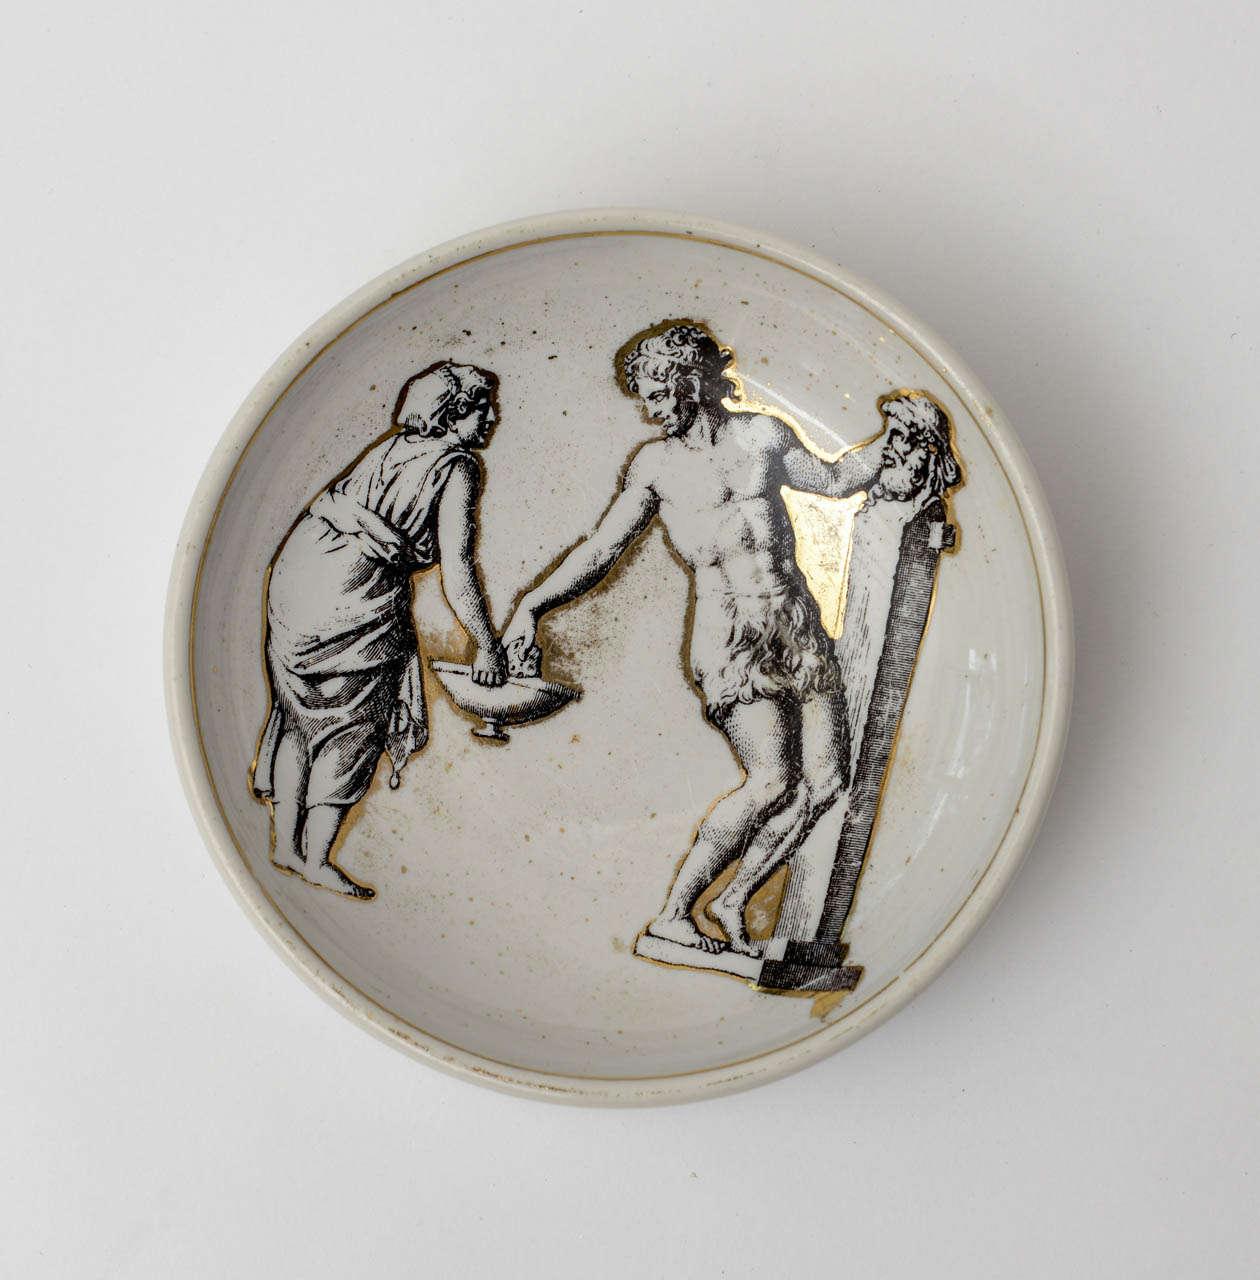 Mid-20th Century Piero Fornasetti Porcelain Bowl Mid-Century Modern For Sale